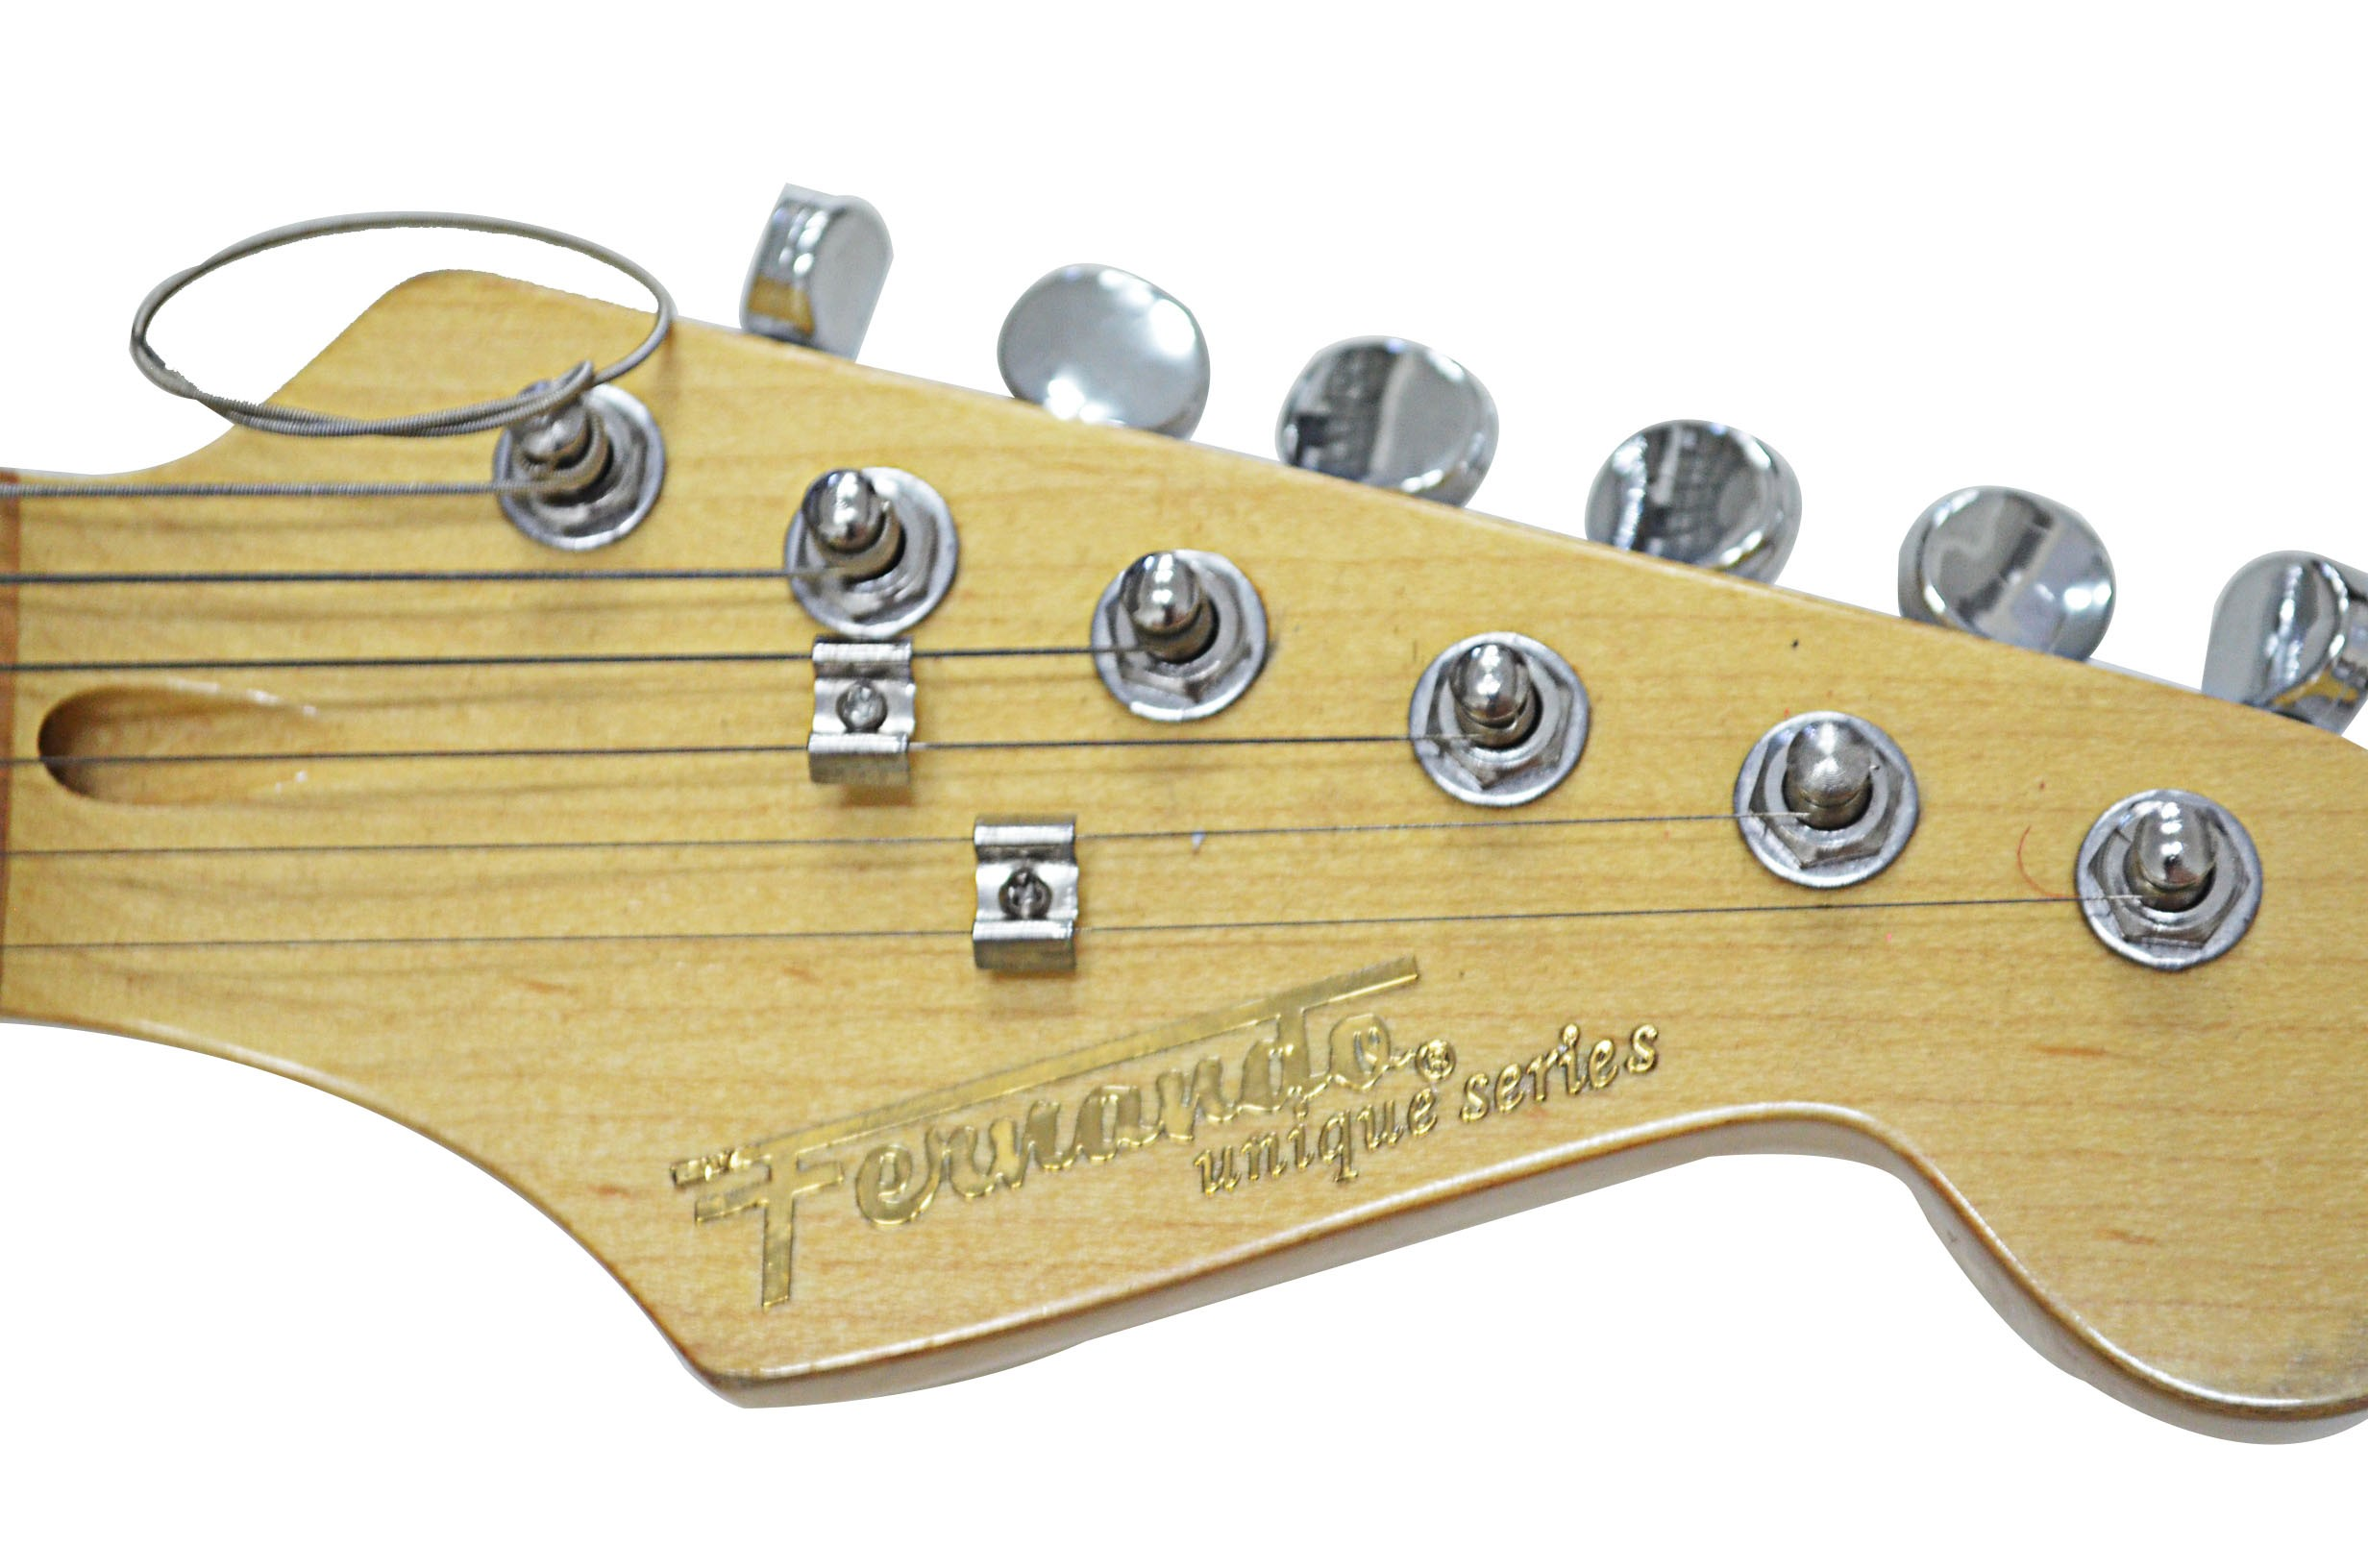 Fernando Unique Series Electric Guitar Buy Online Preloved 100